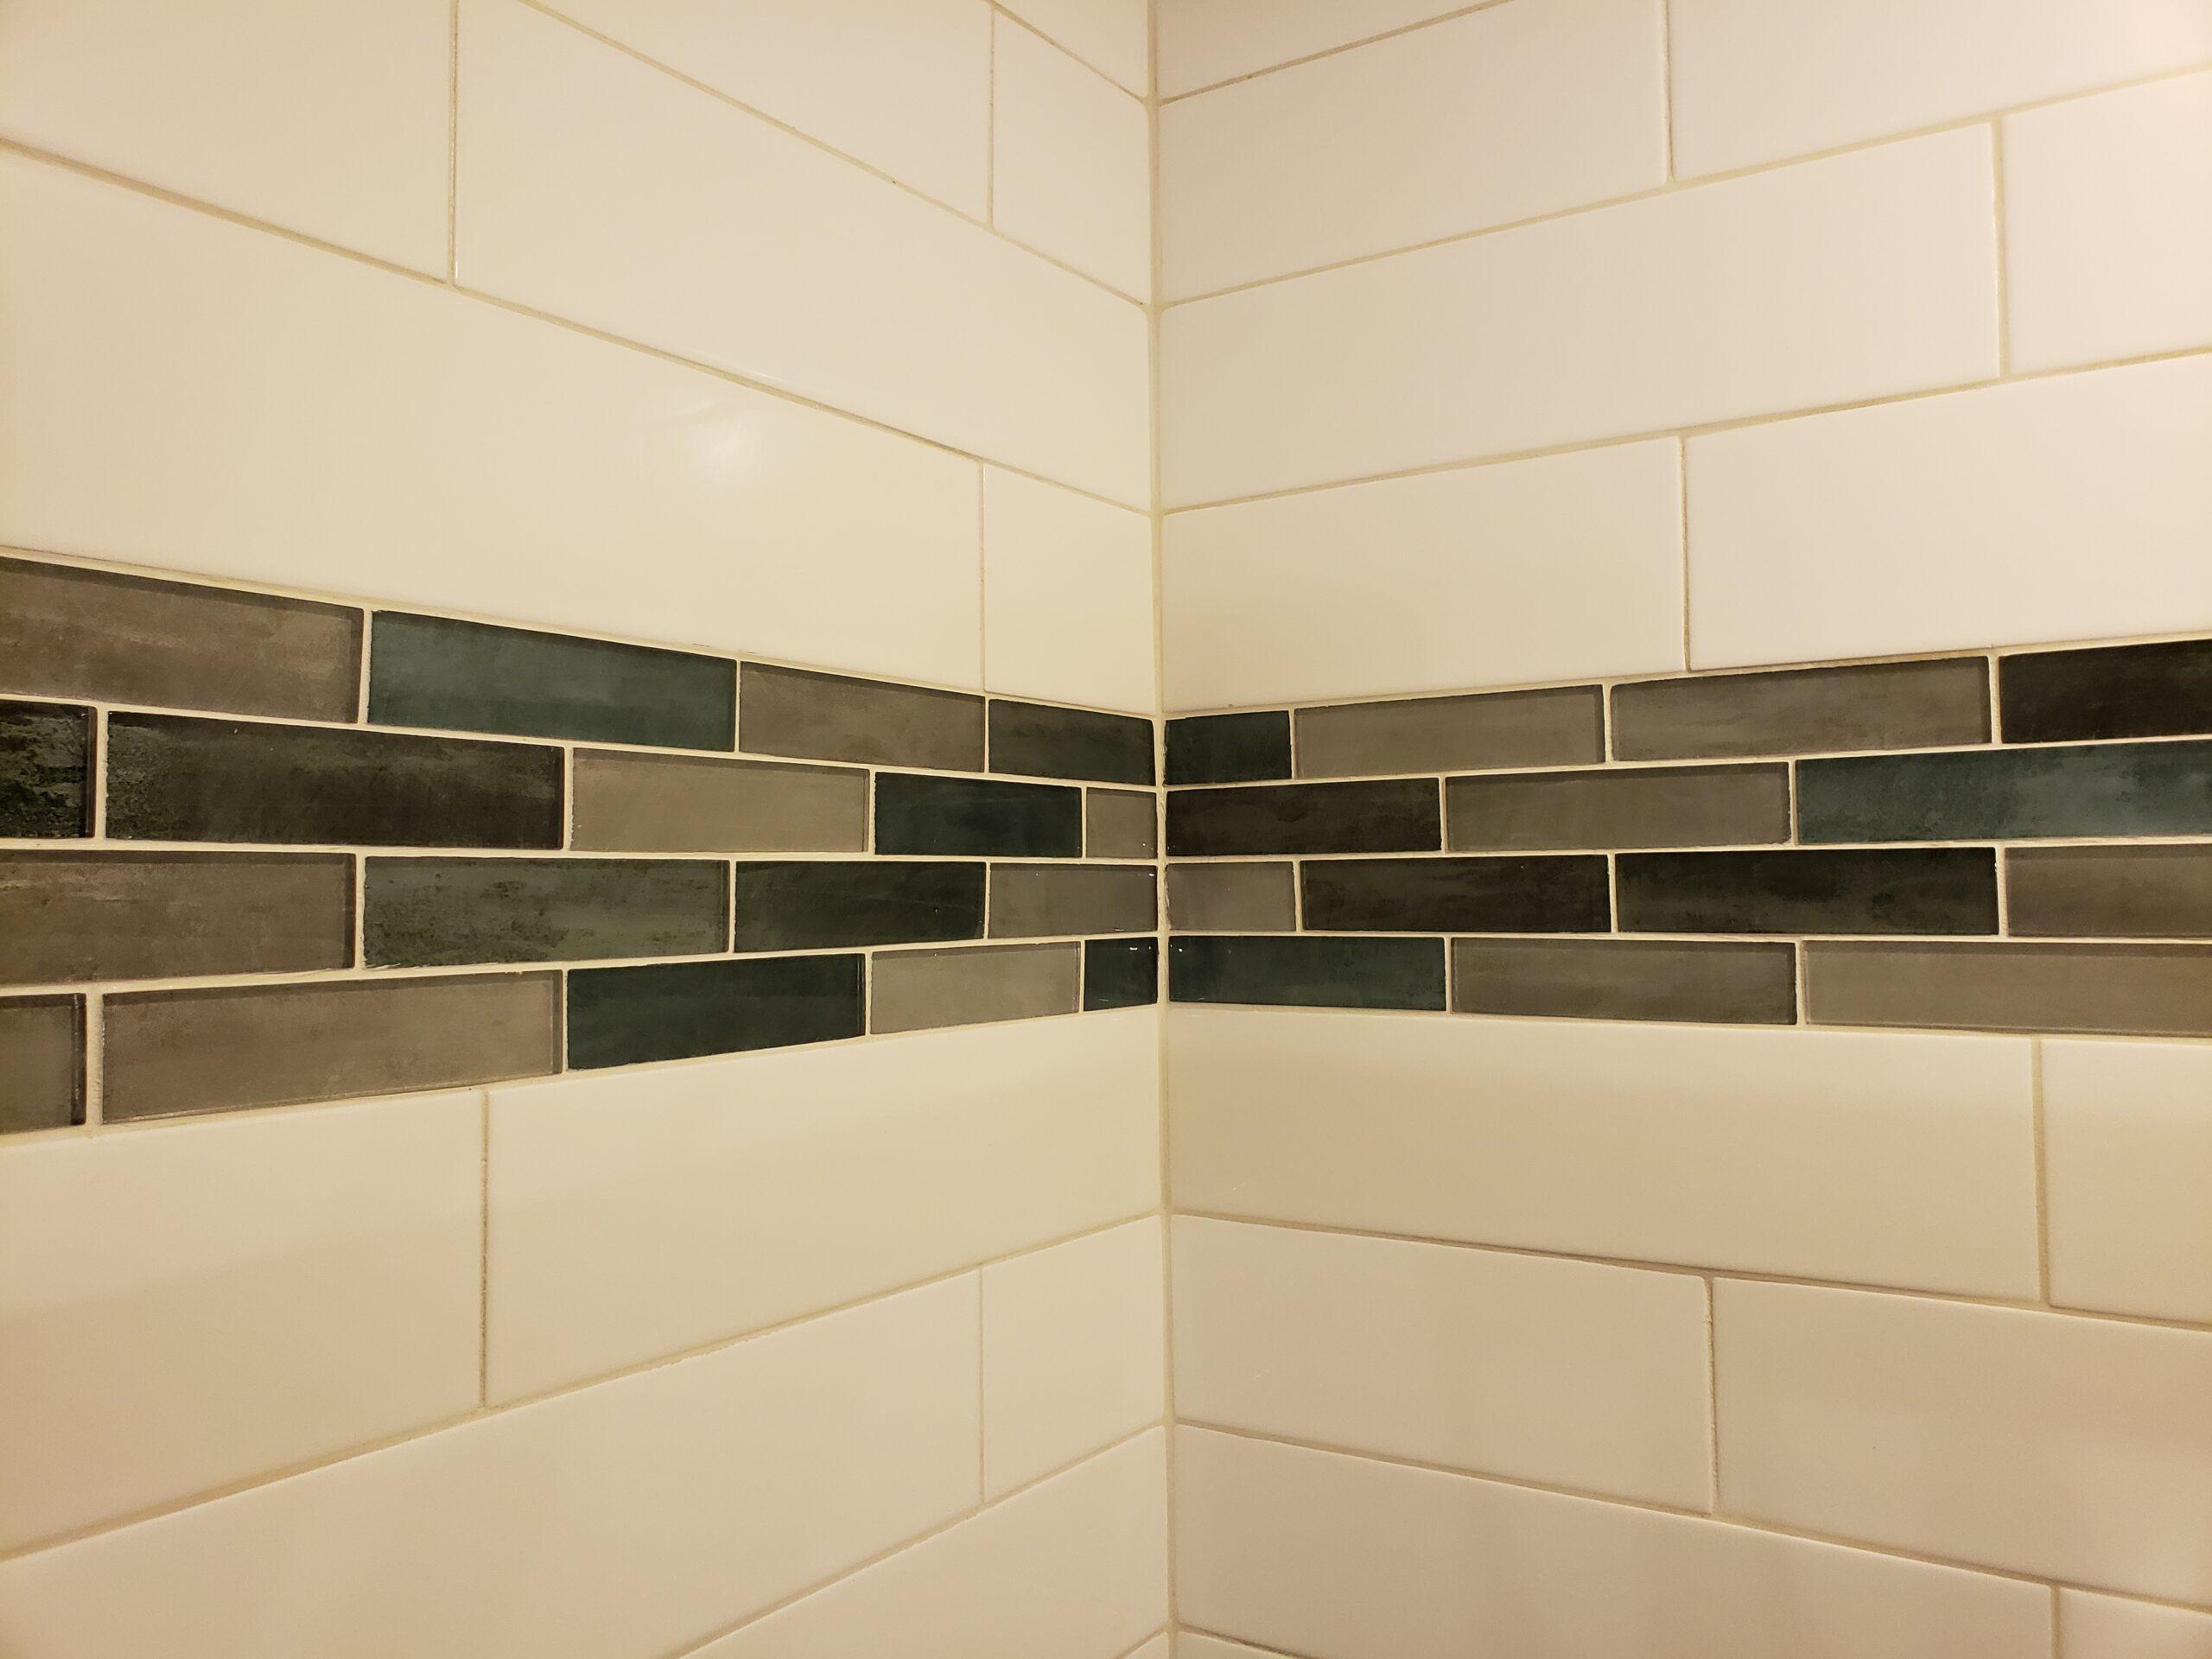 modern farmhouse bathroom shower materials selection service diva by design harlingen interior designer 78550 treasure hills